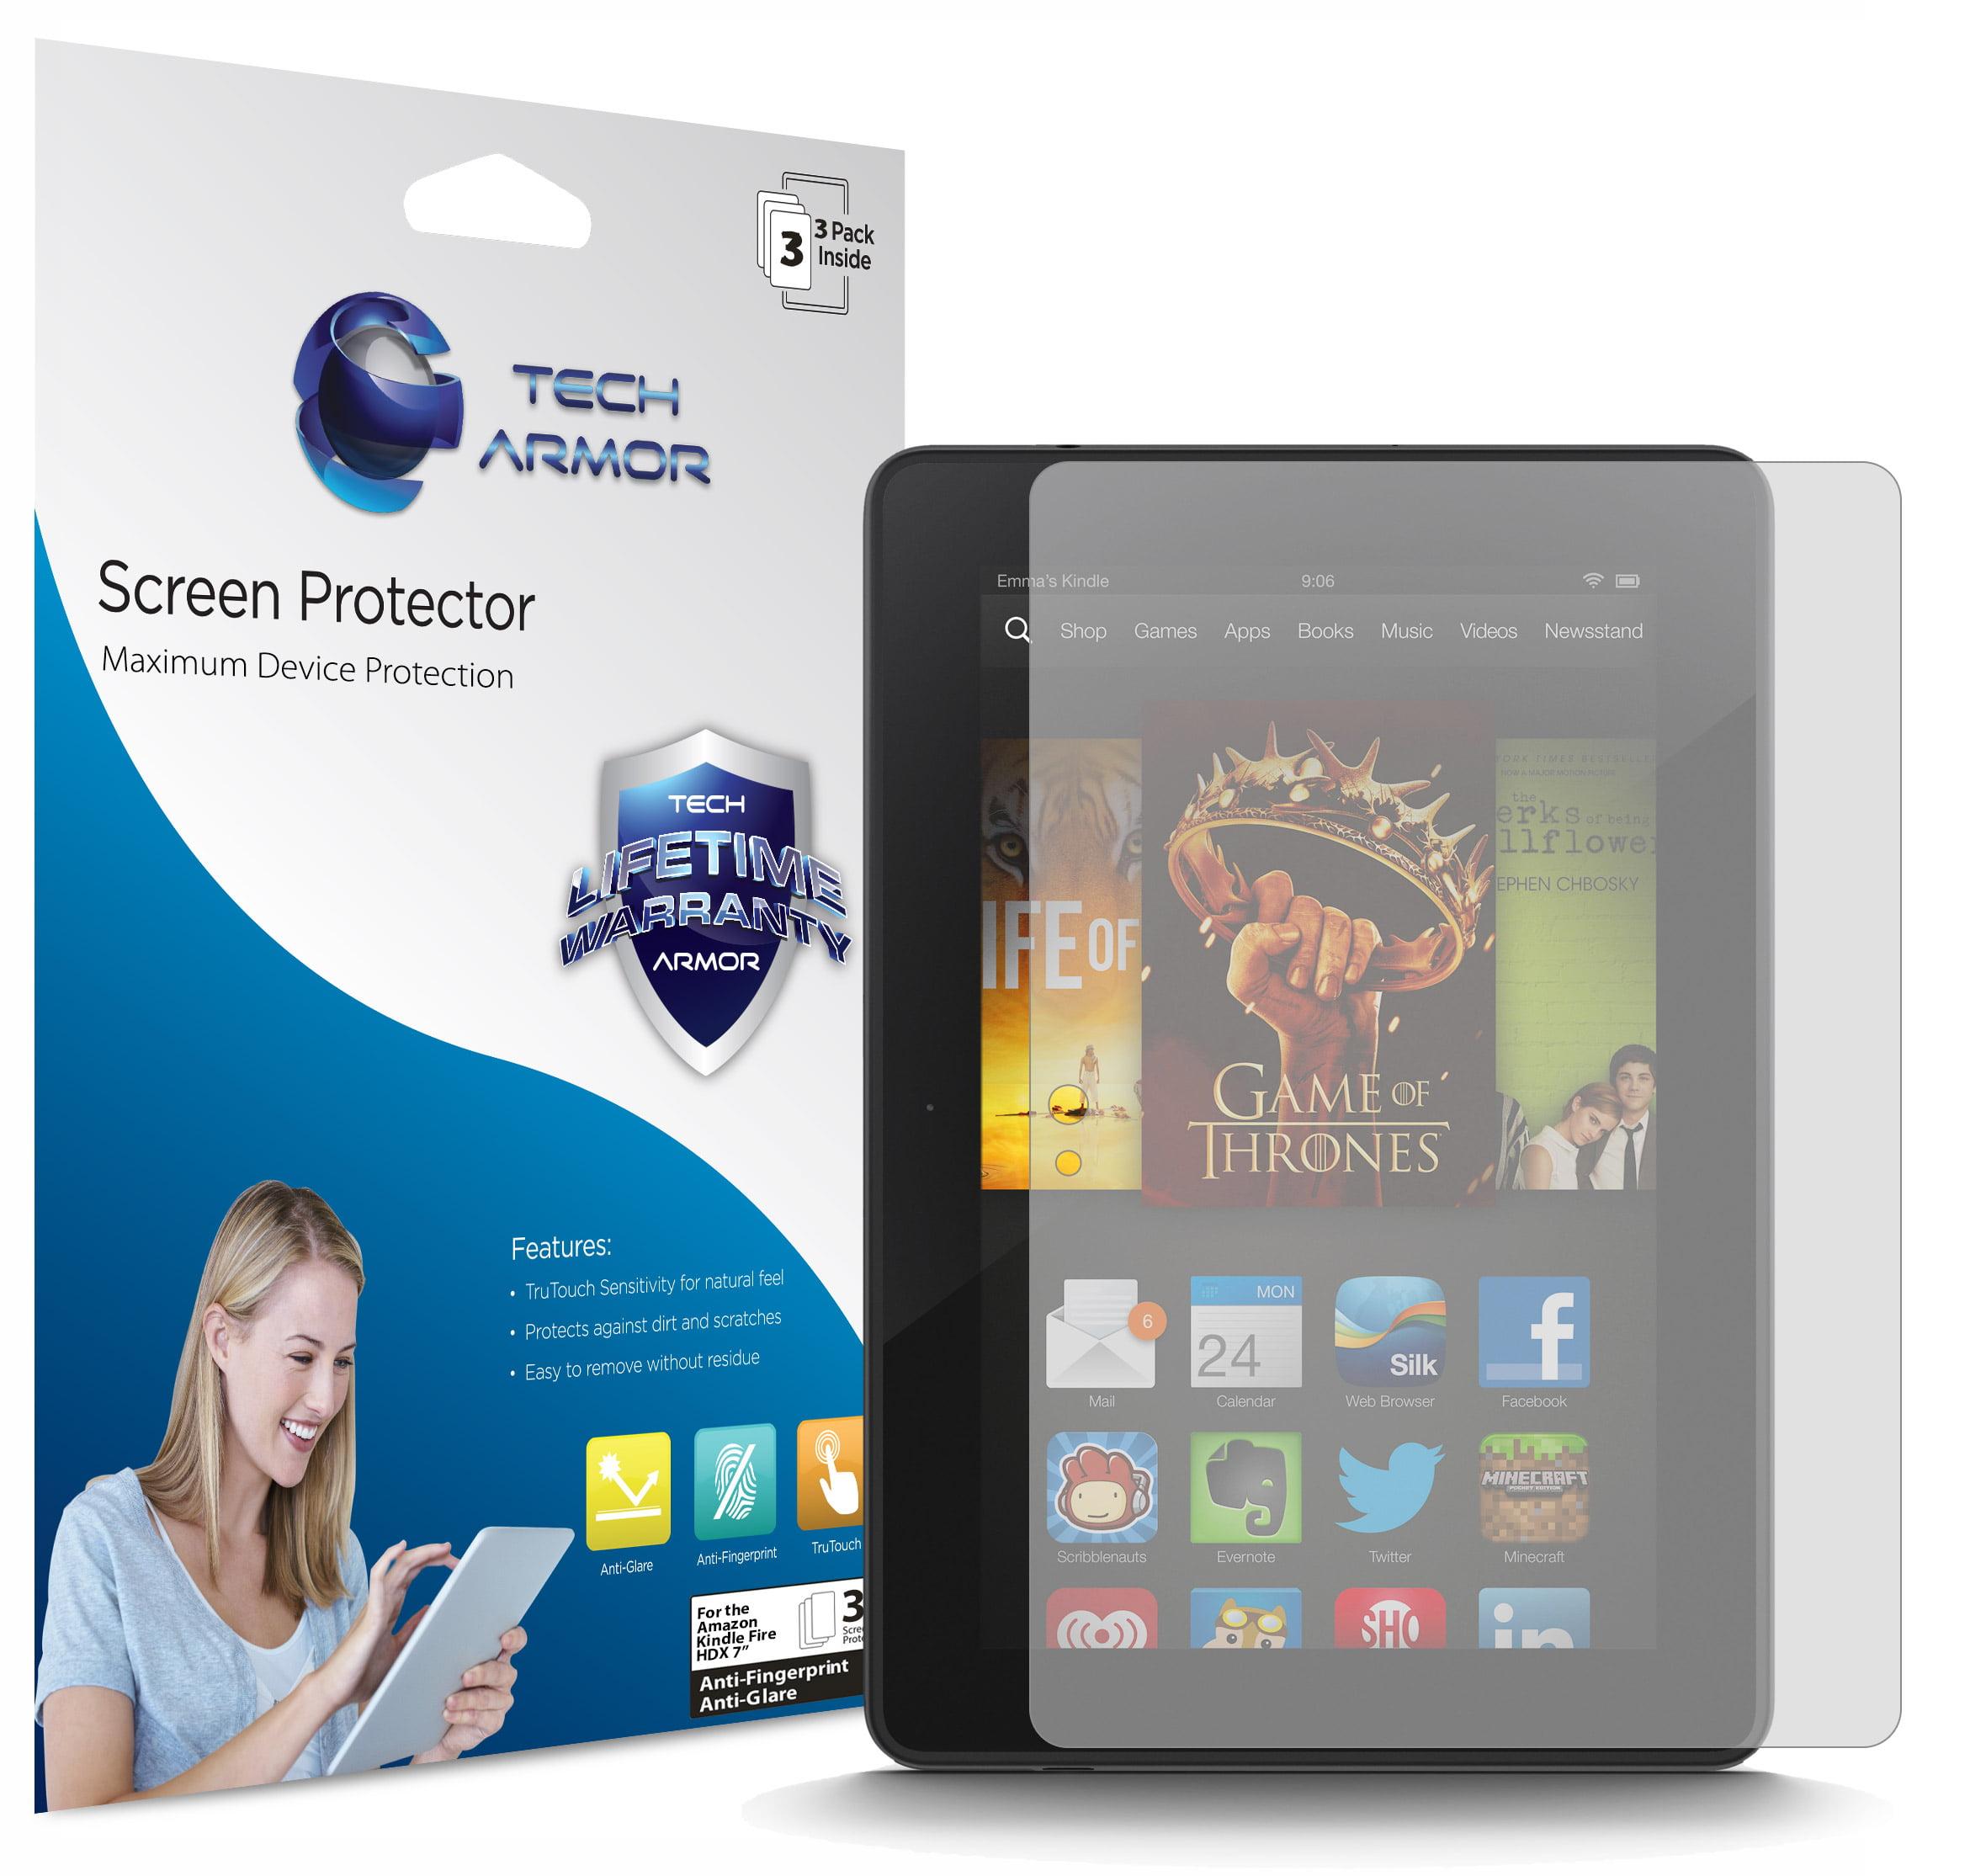 "Kindle Fire HDX Screen Protector, Tech Armor Anti-Glare/Anti-Fingerprint Amazon Kindle Fire HDX 7""  (2013) Film Screen Protector [3-Pack]"